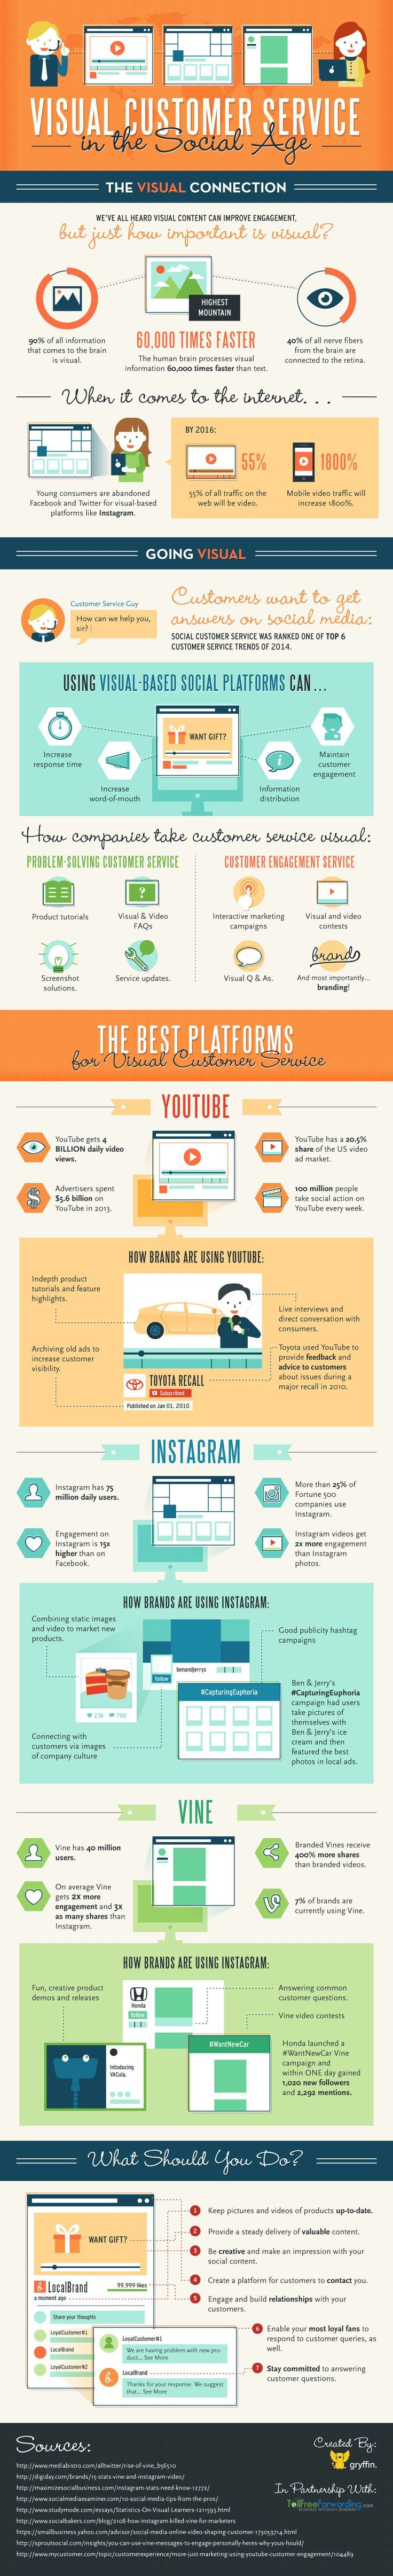 Visual Customer Service in the Social Age - #infographic #socialmedia #contentmarketing